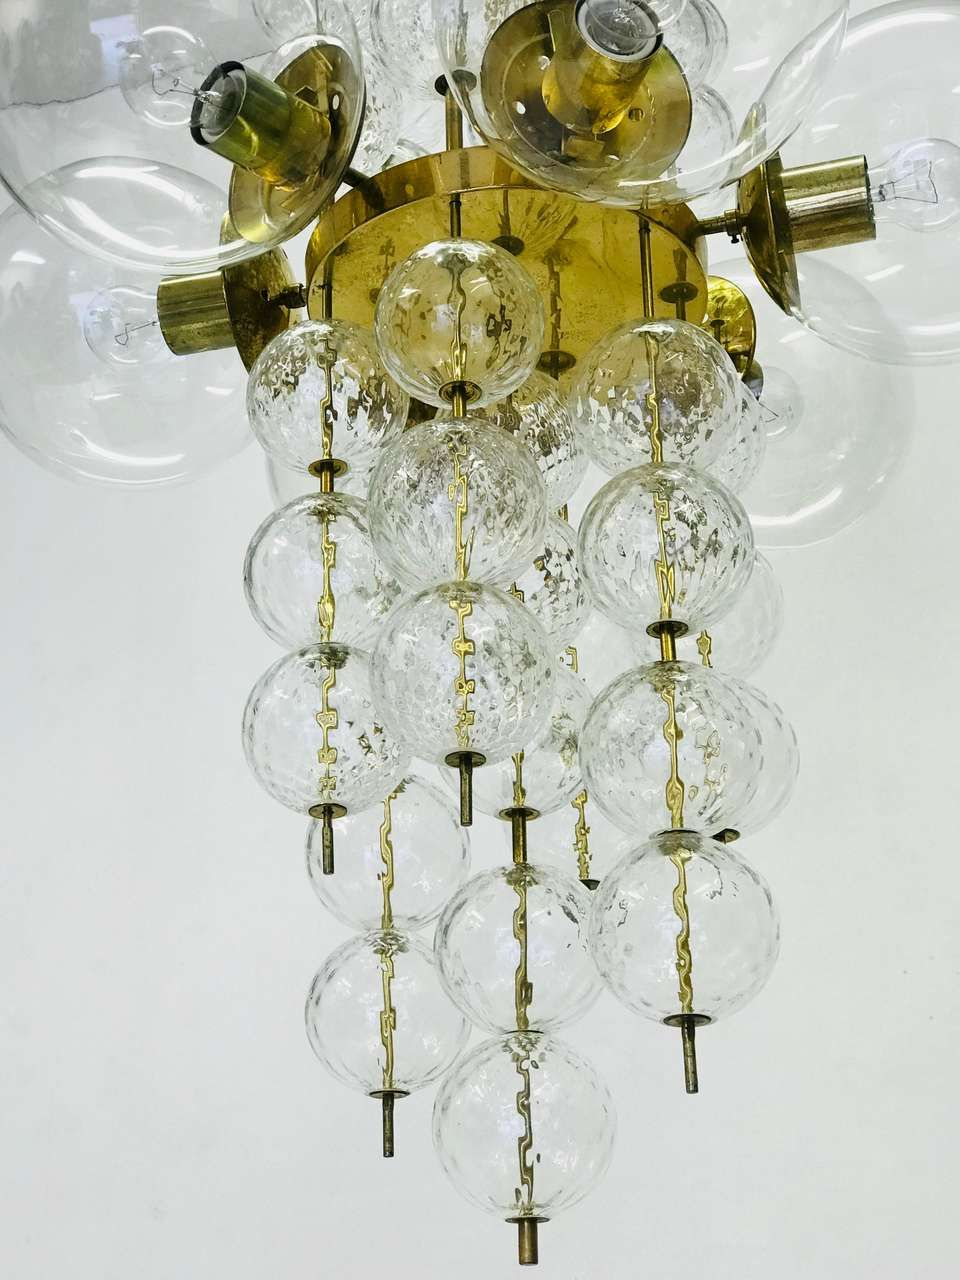 Large Glass Chandelier Kamenicky Senov 1965 Glass Chandelier